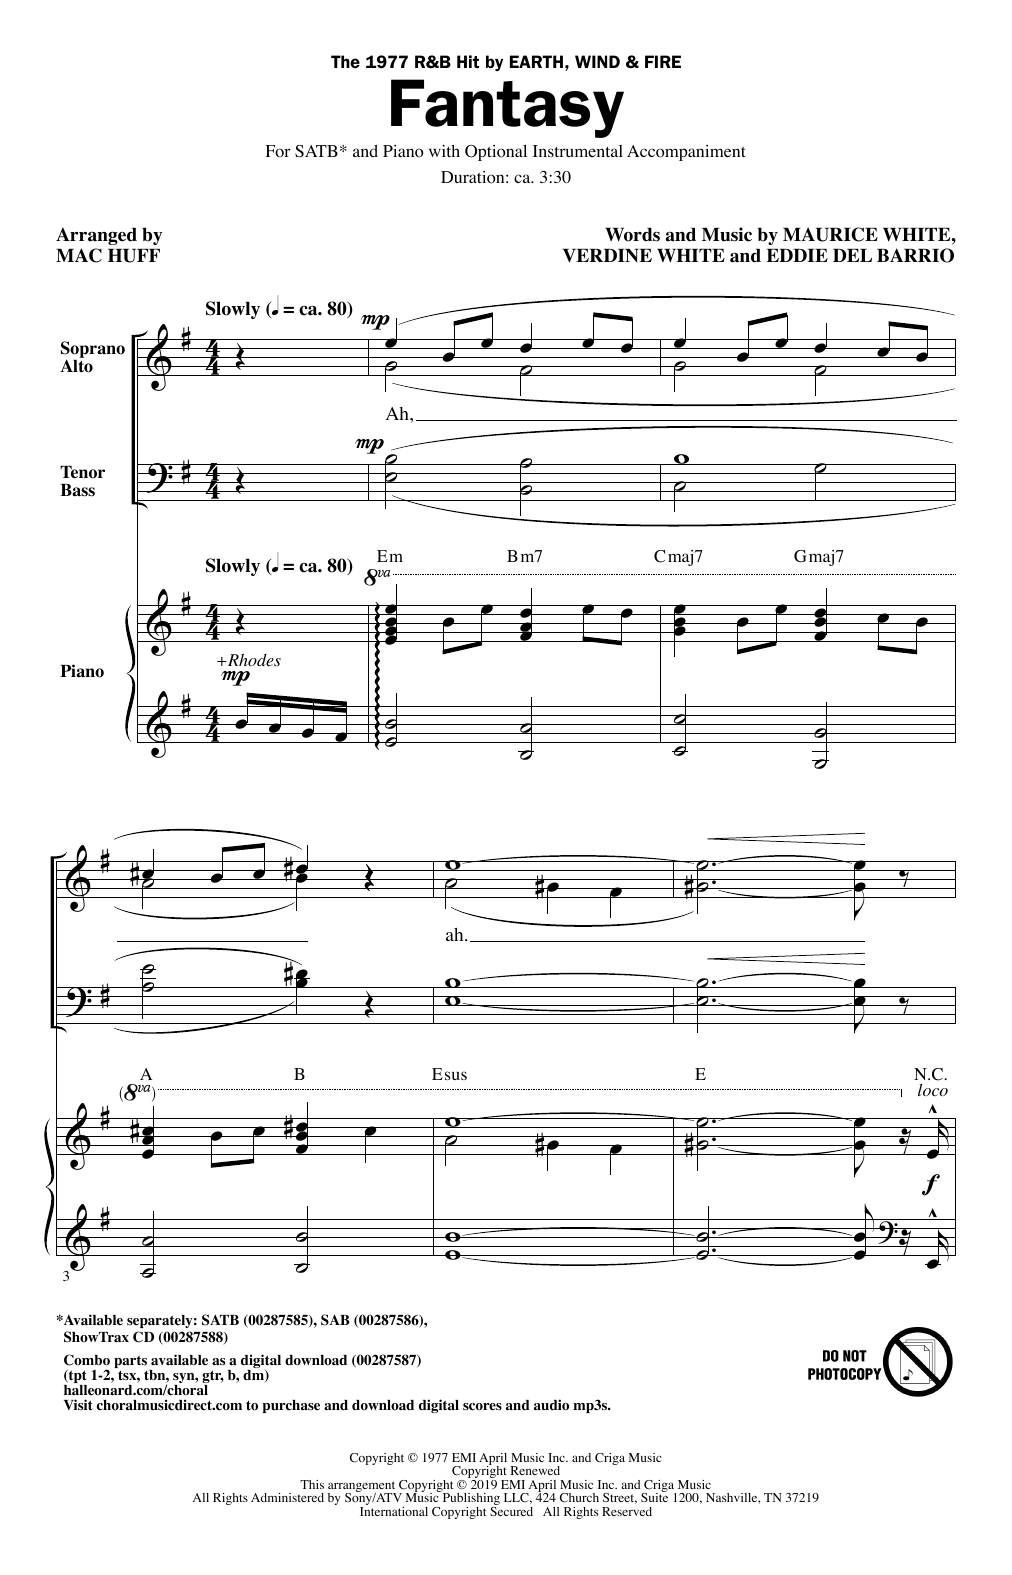 Fantasy (arr. Mac Huff) (SATB Choir)